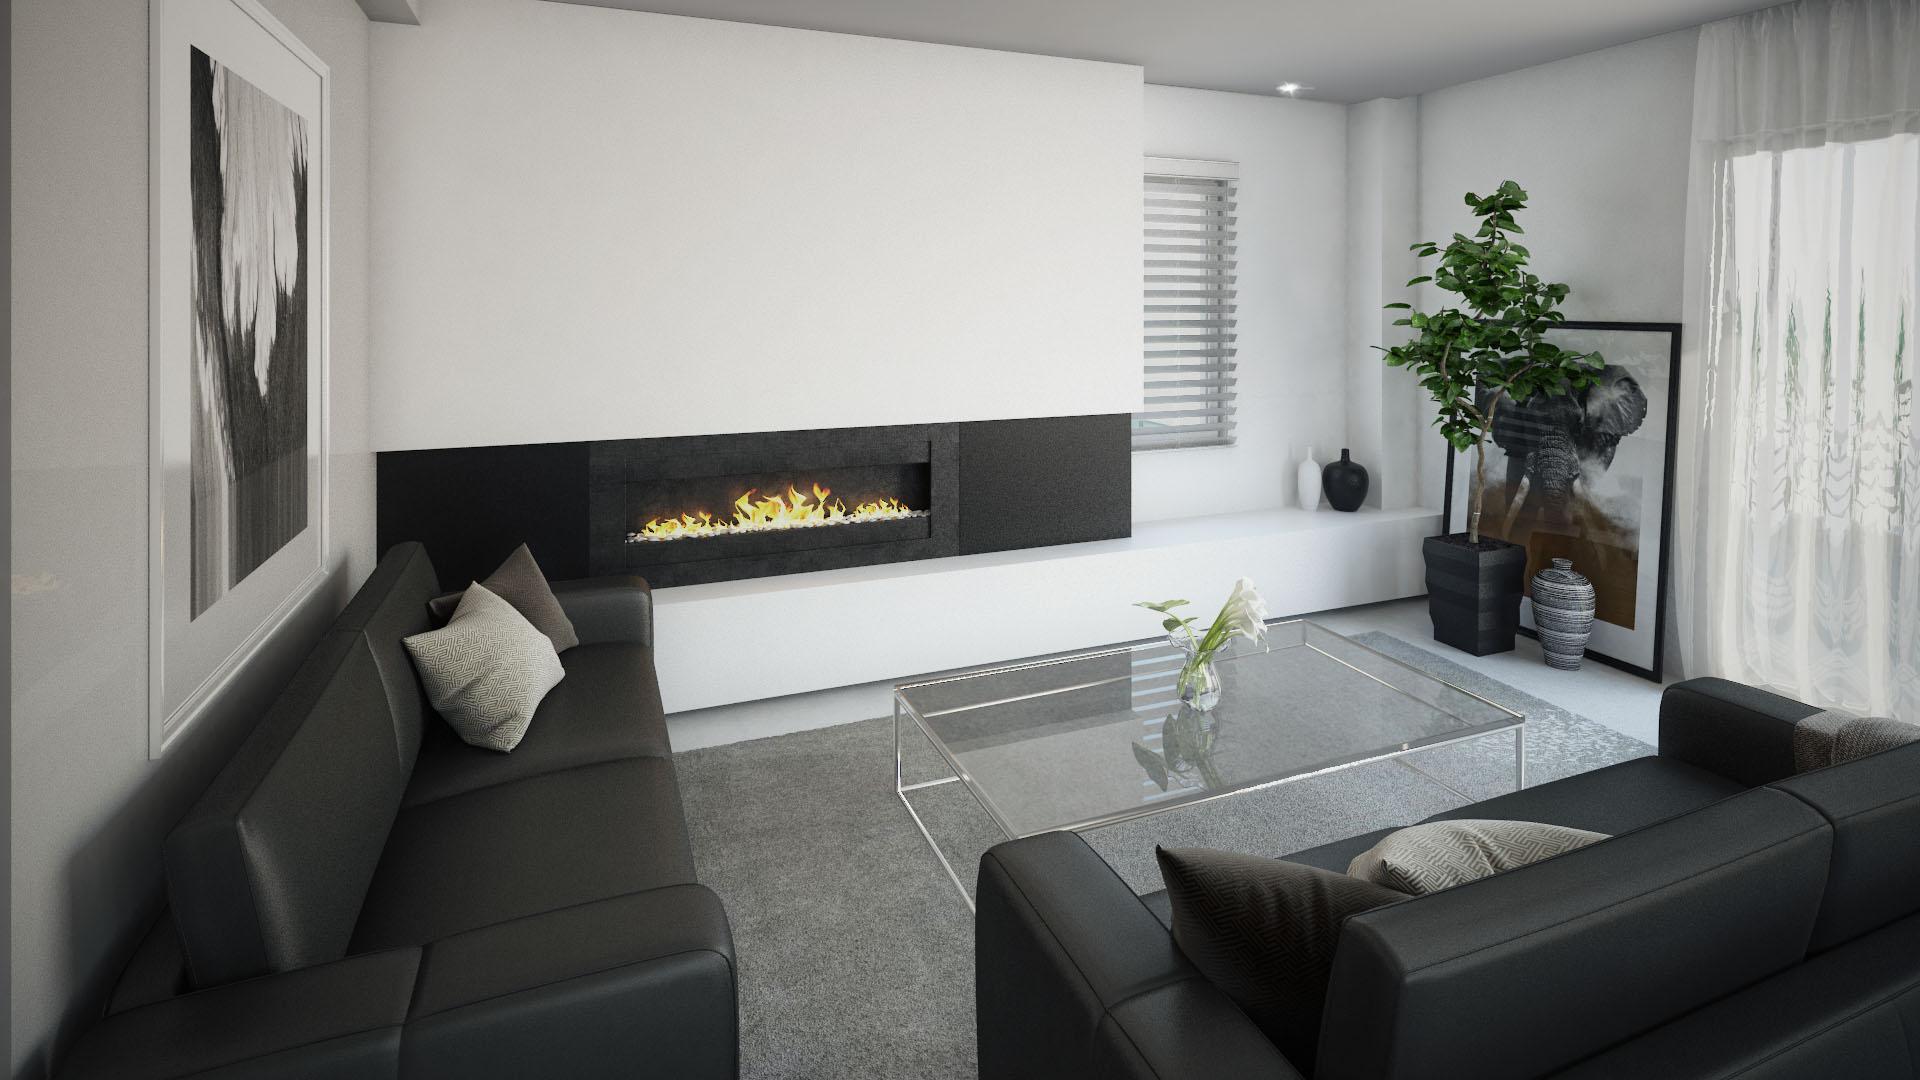 archicostudio_oreokastro_h1_living-room